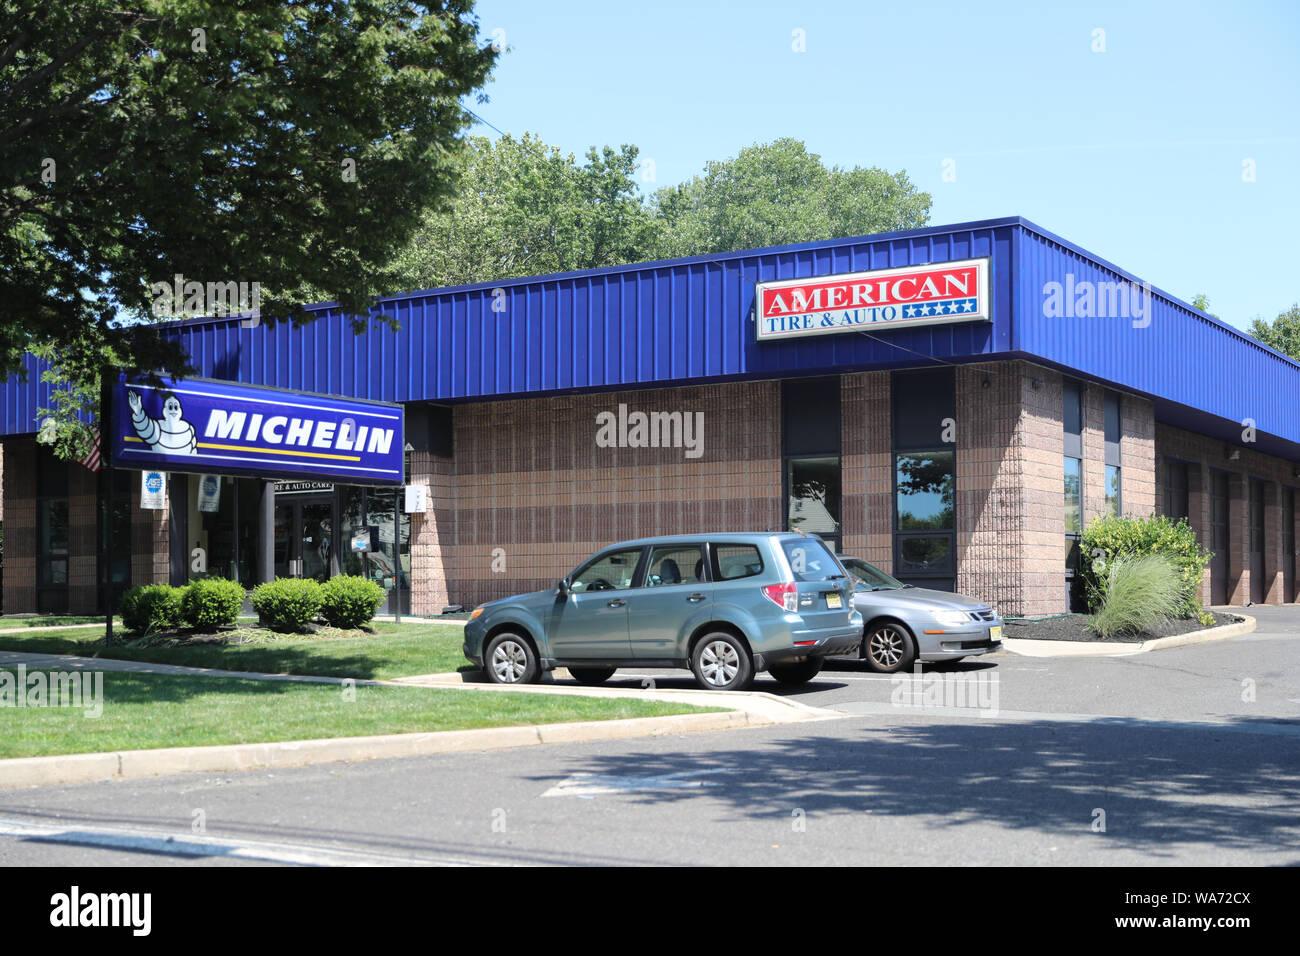 American Tire And Auto >> Princeton New Jersey Usa June 23 2019 American Tire